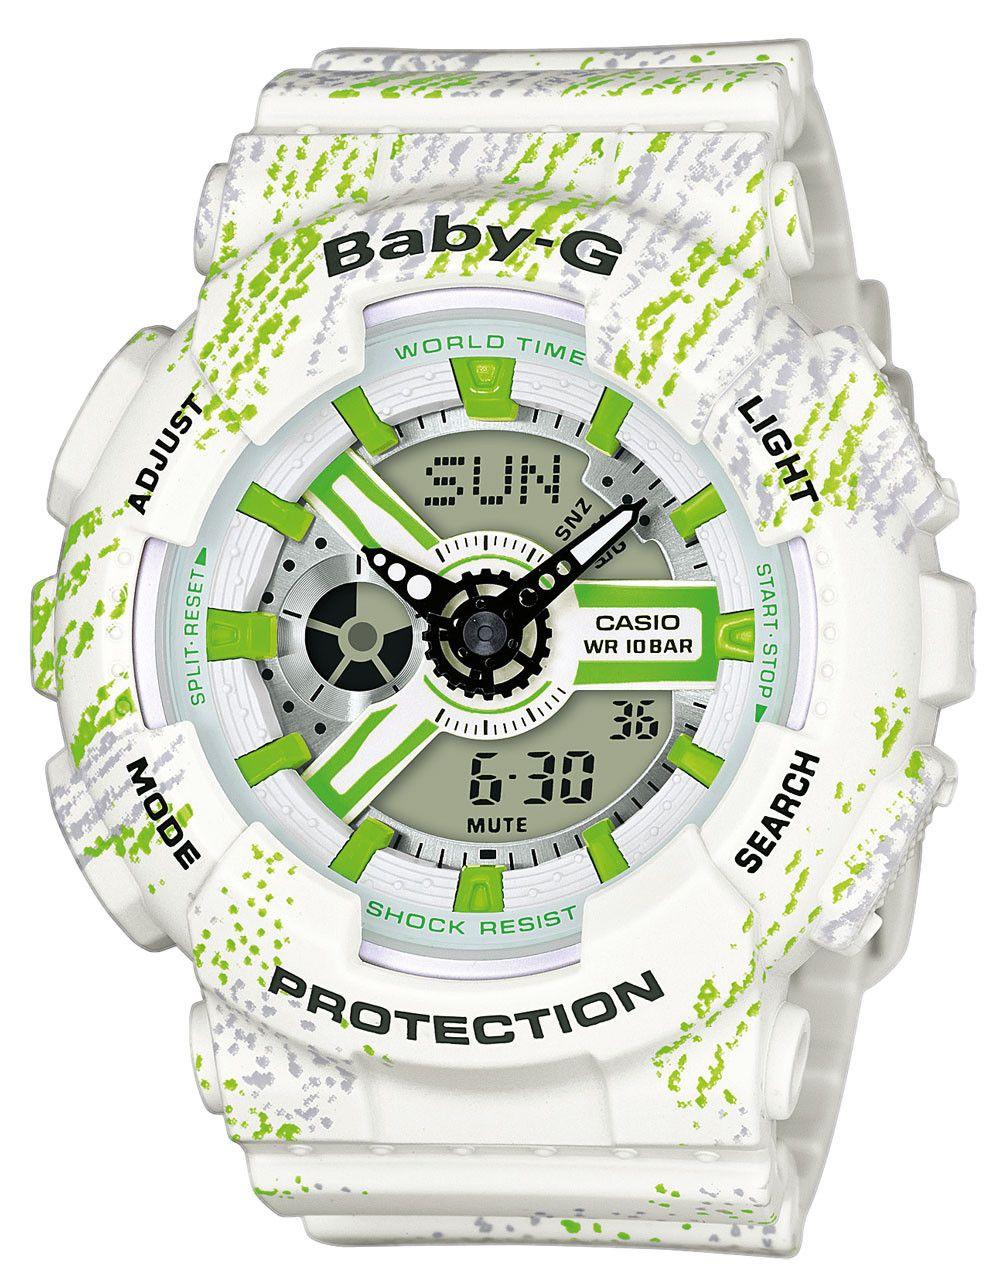 G Anadigi5 110tx 7aer Tagesalarme Casio Ba Armbanduhr Sowie Baby J1clFTK